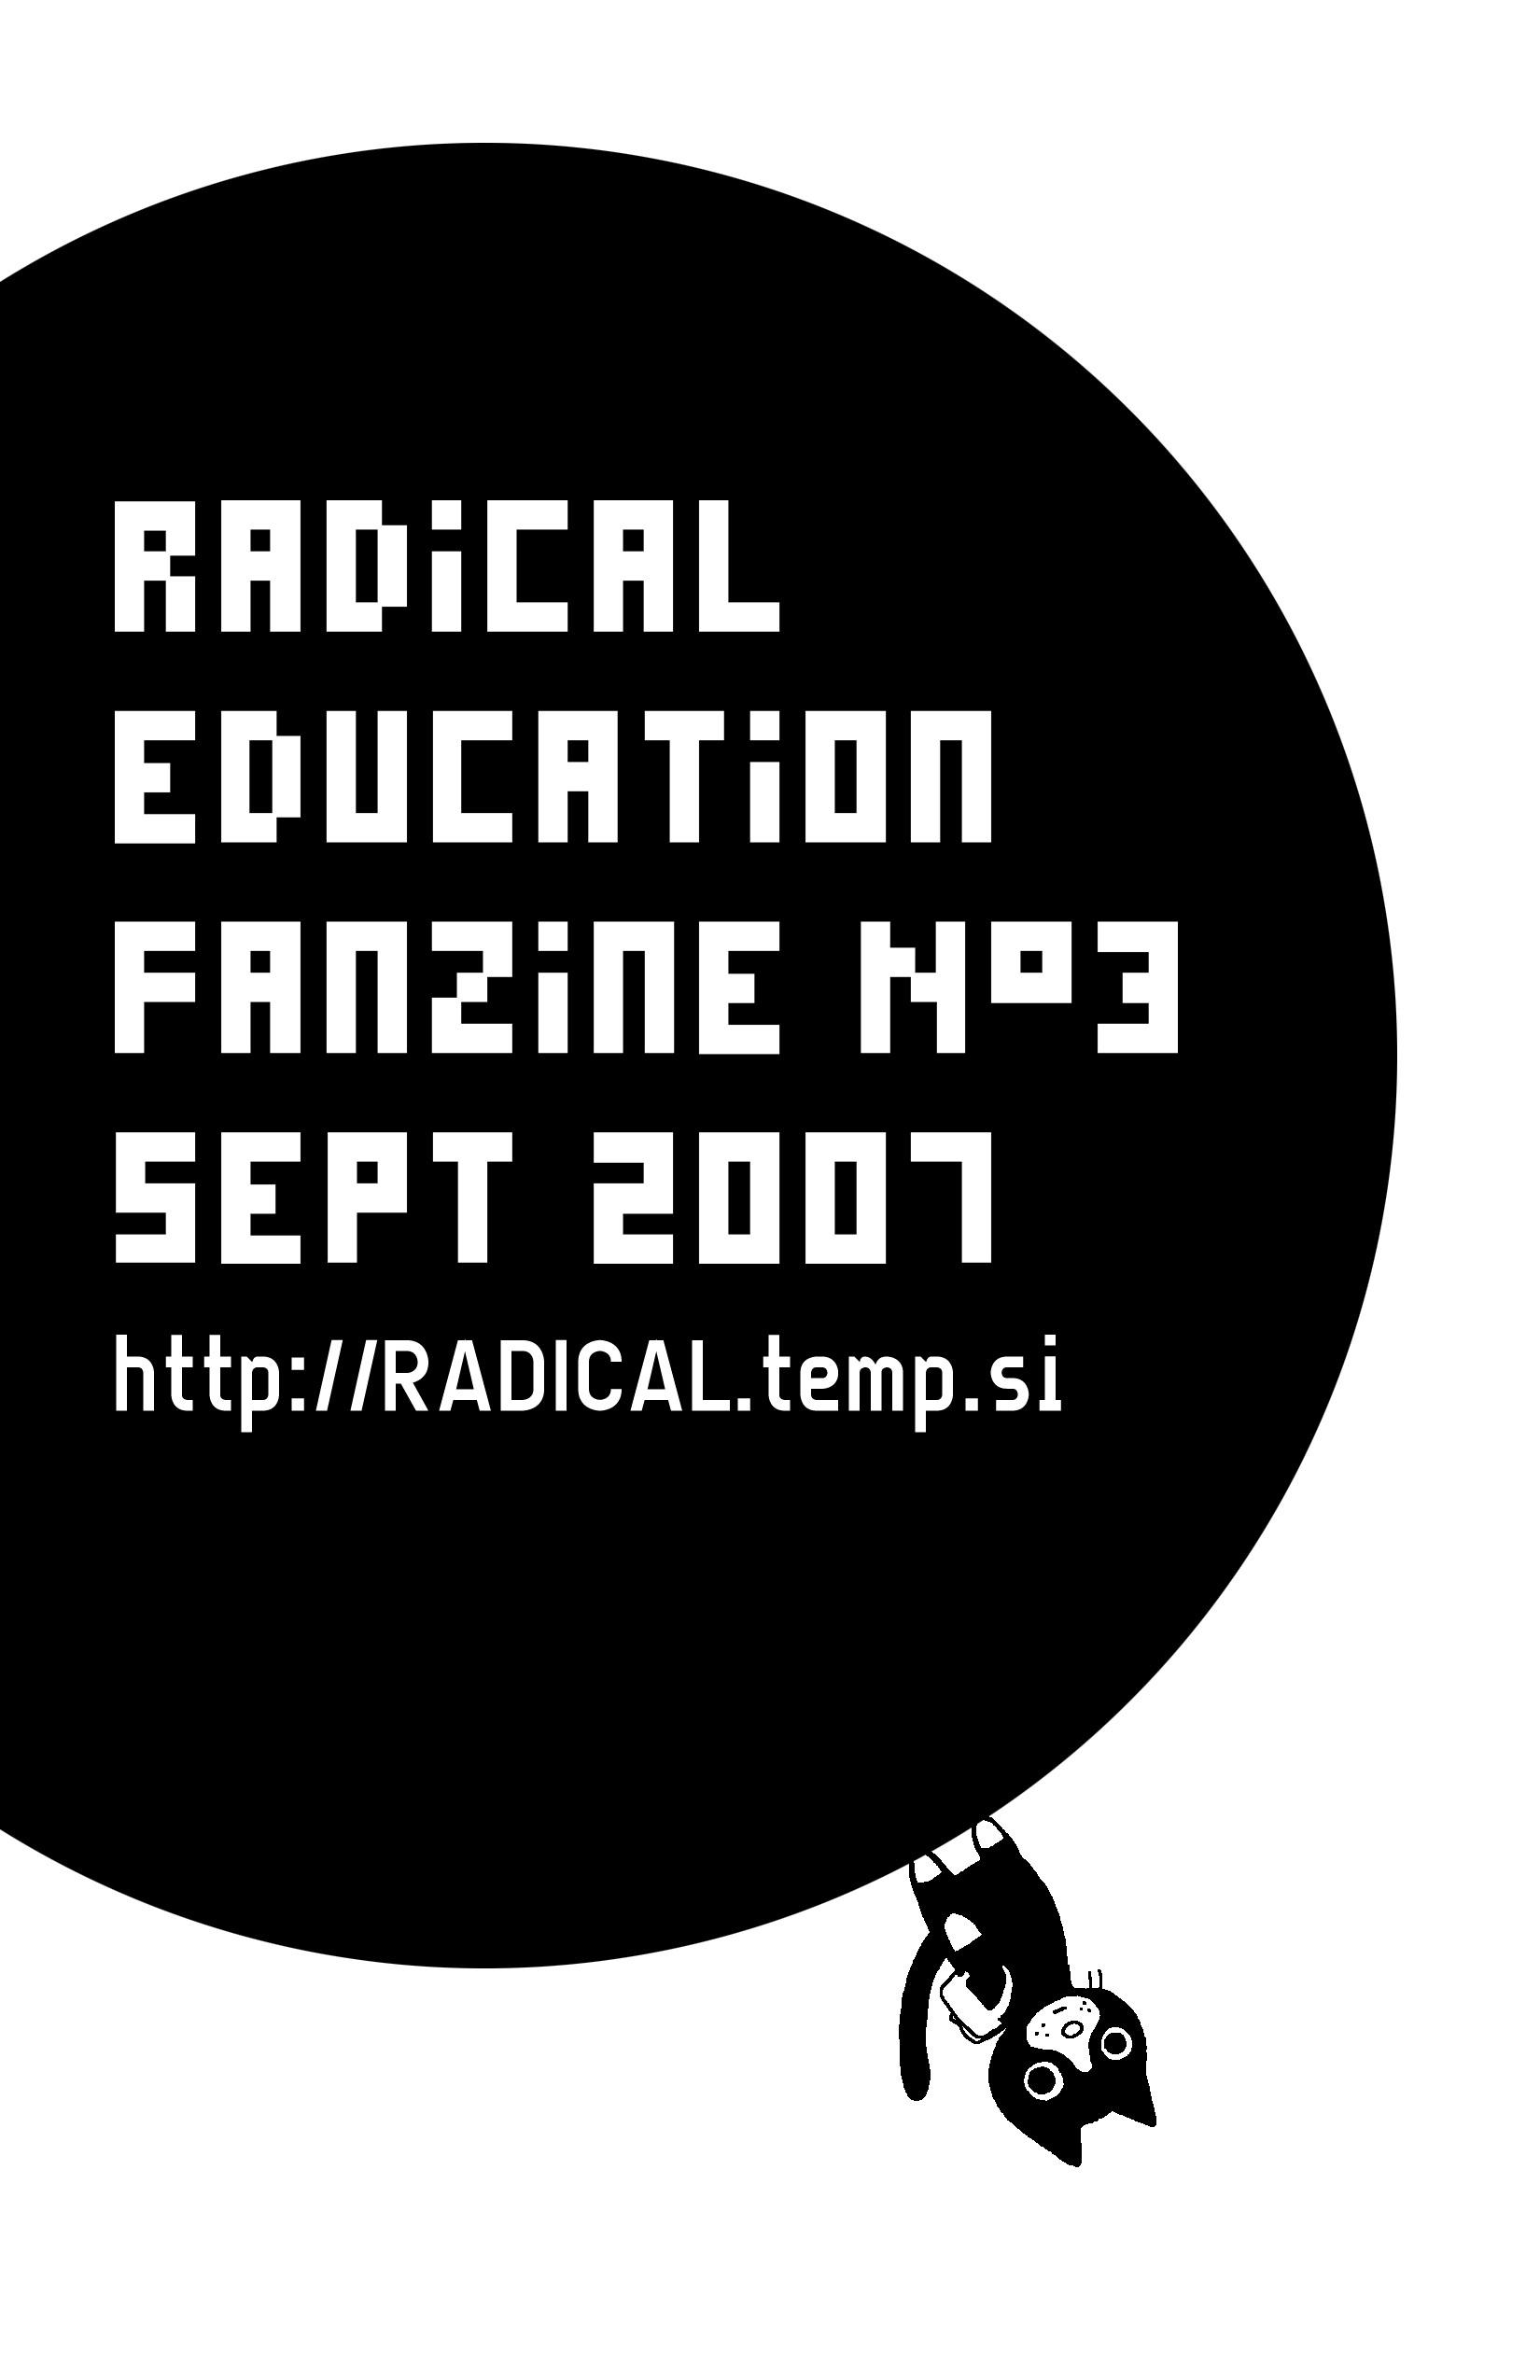 20070903_raded03_01_frontcover.jpg